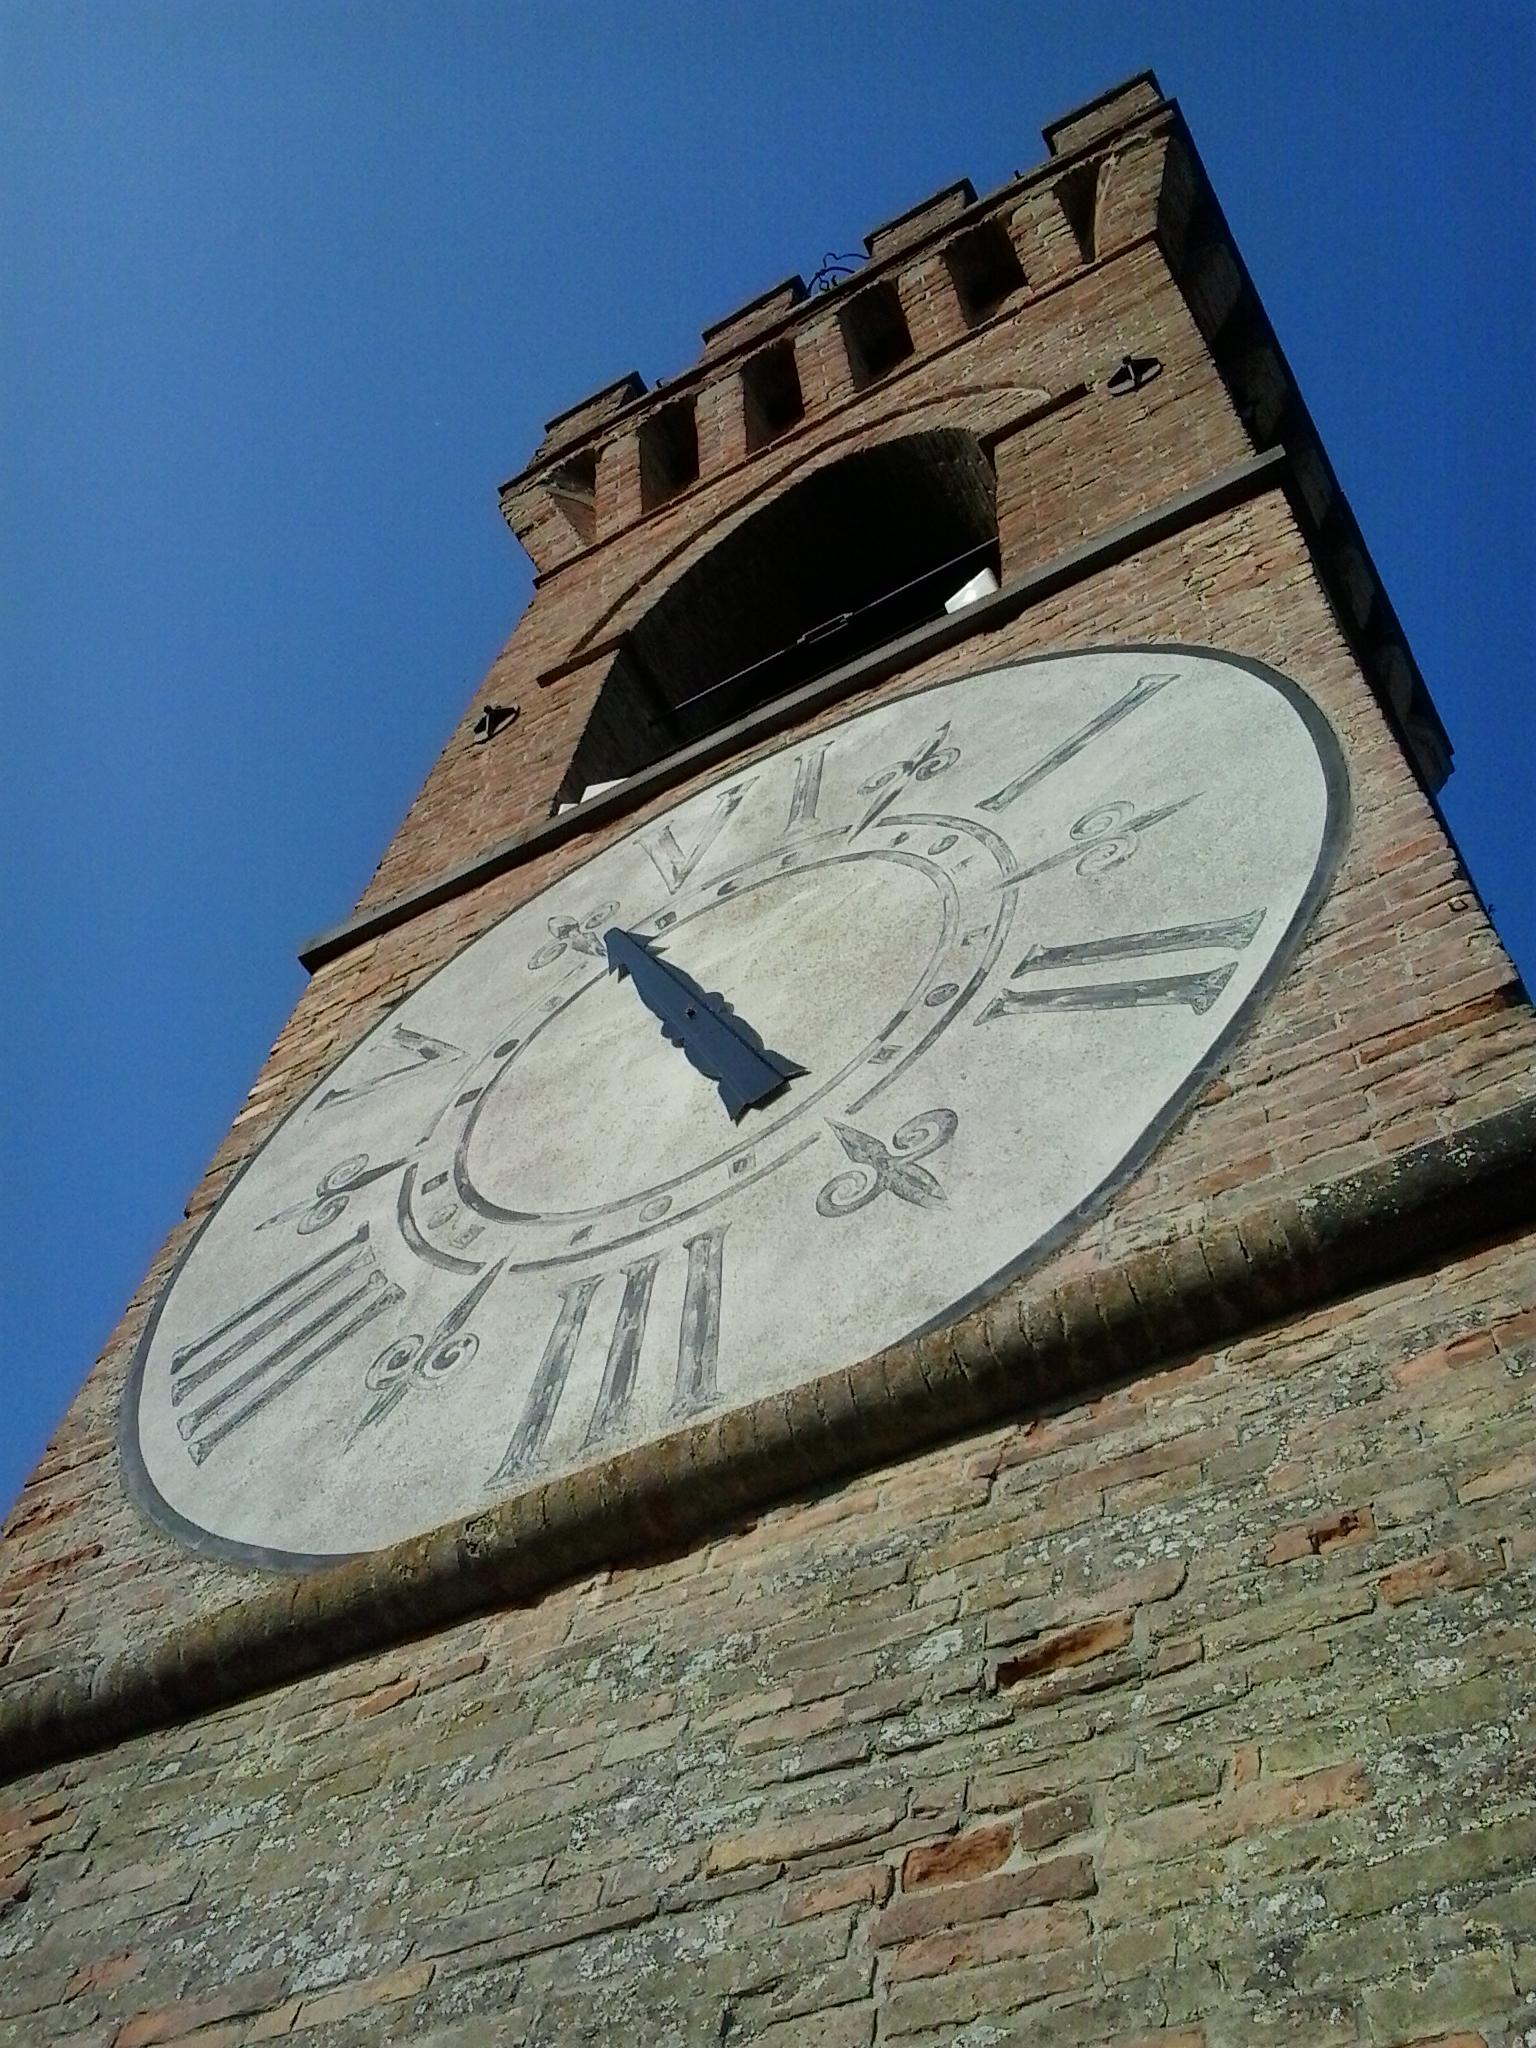 Brisighella (Ravenna, Emilia Romagna)